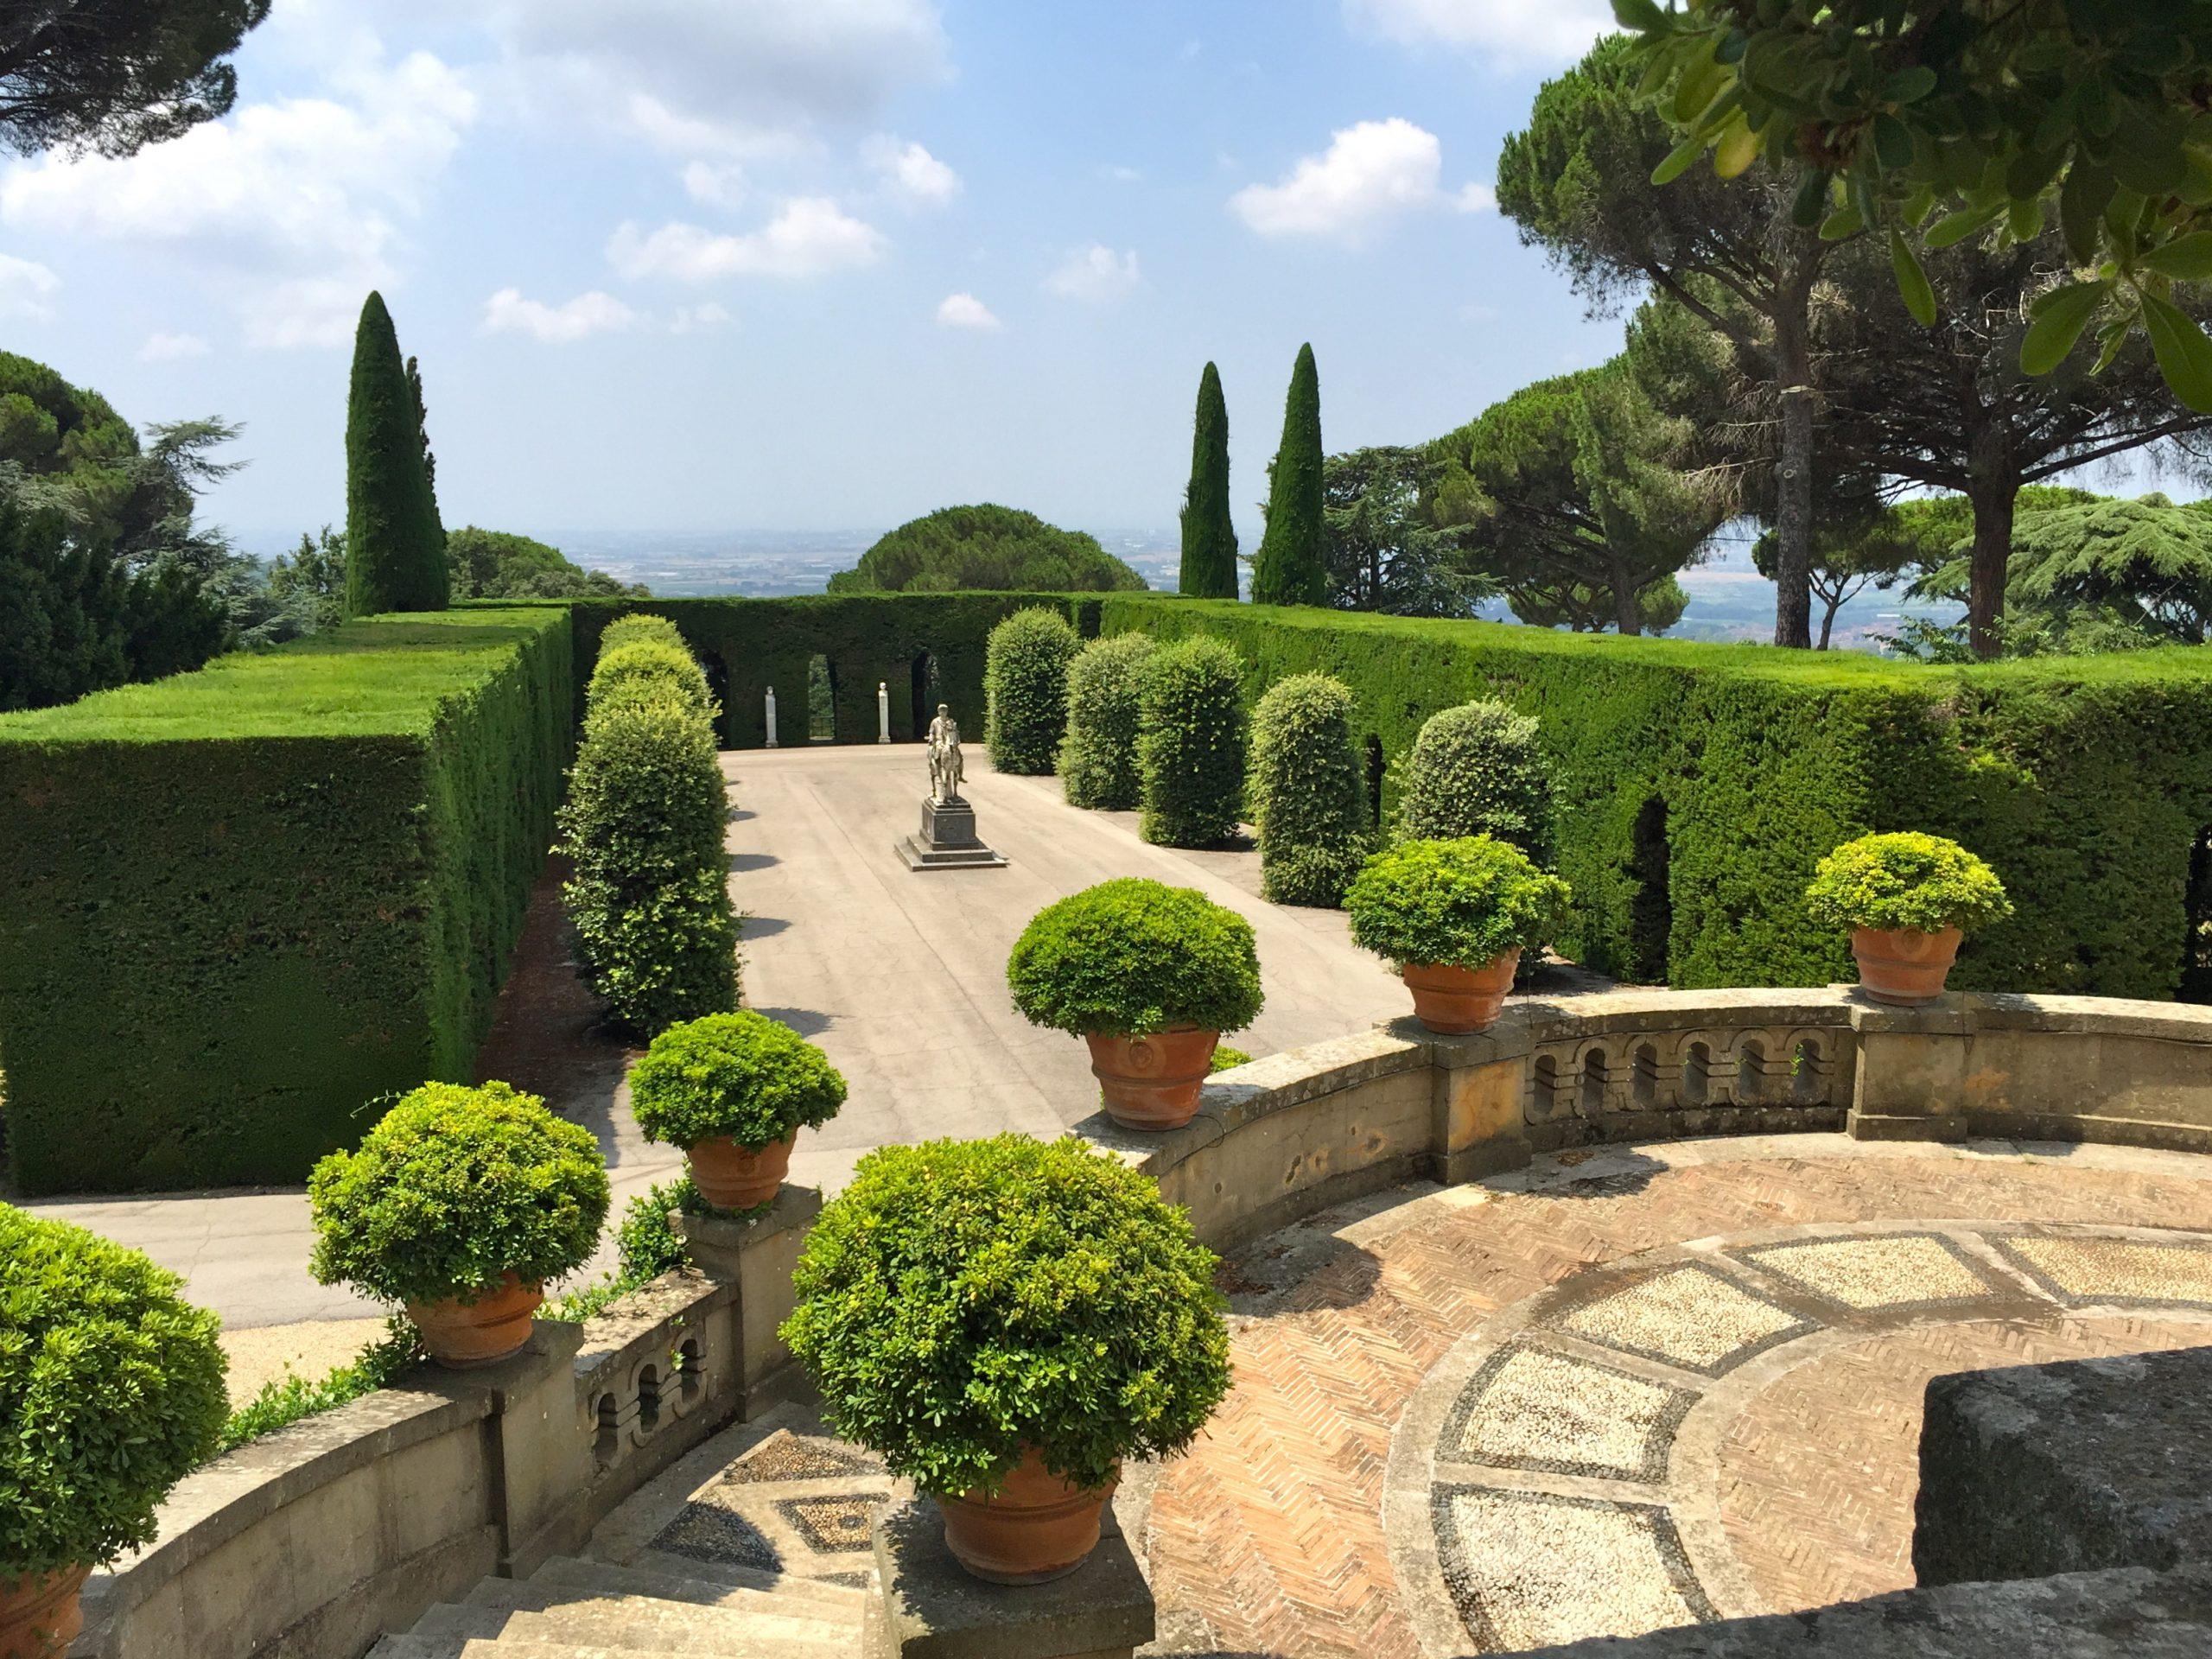 Castel,Gandolfo,,Italy,-,July,11,,2015:,A,Panoramic,View